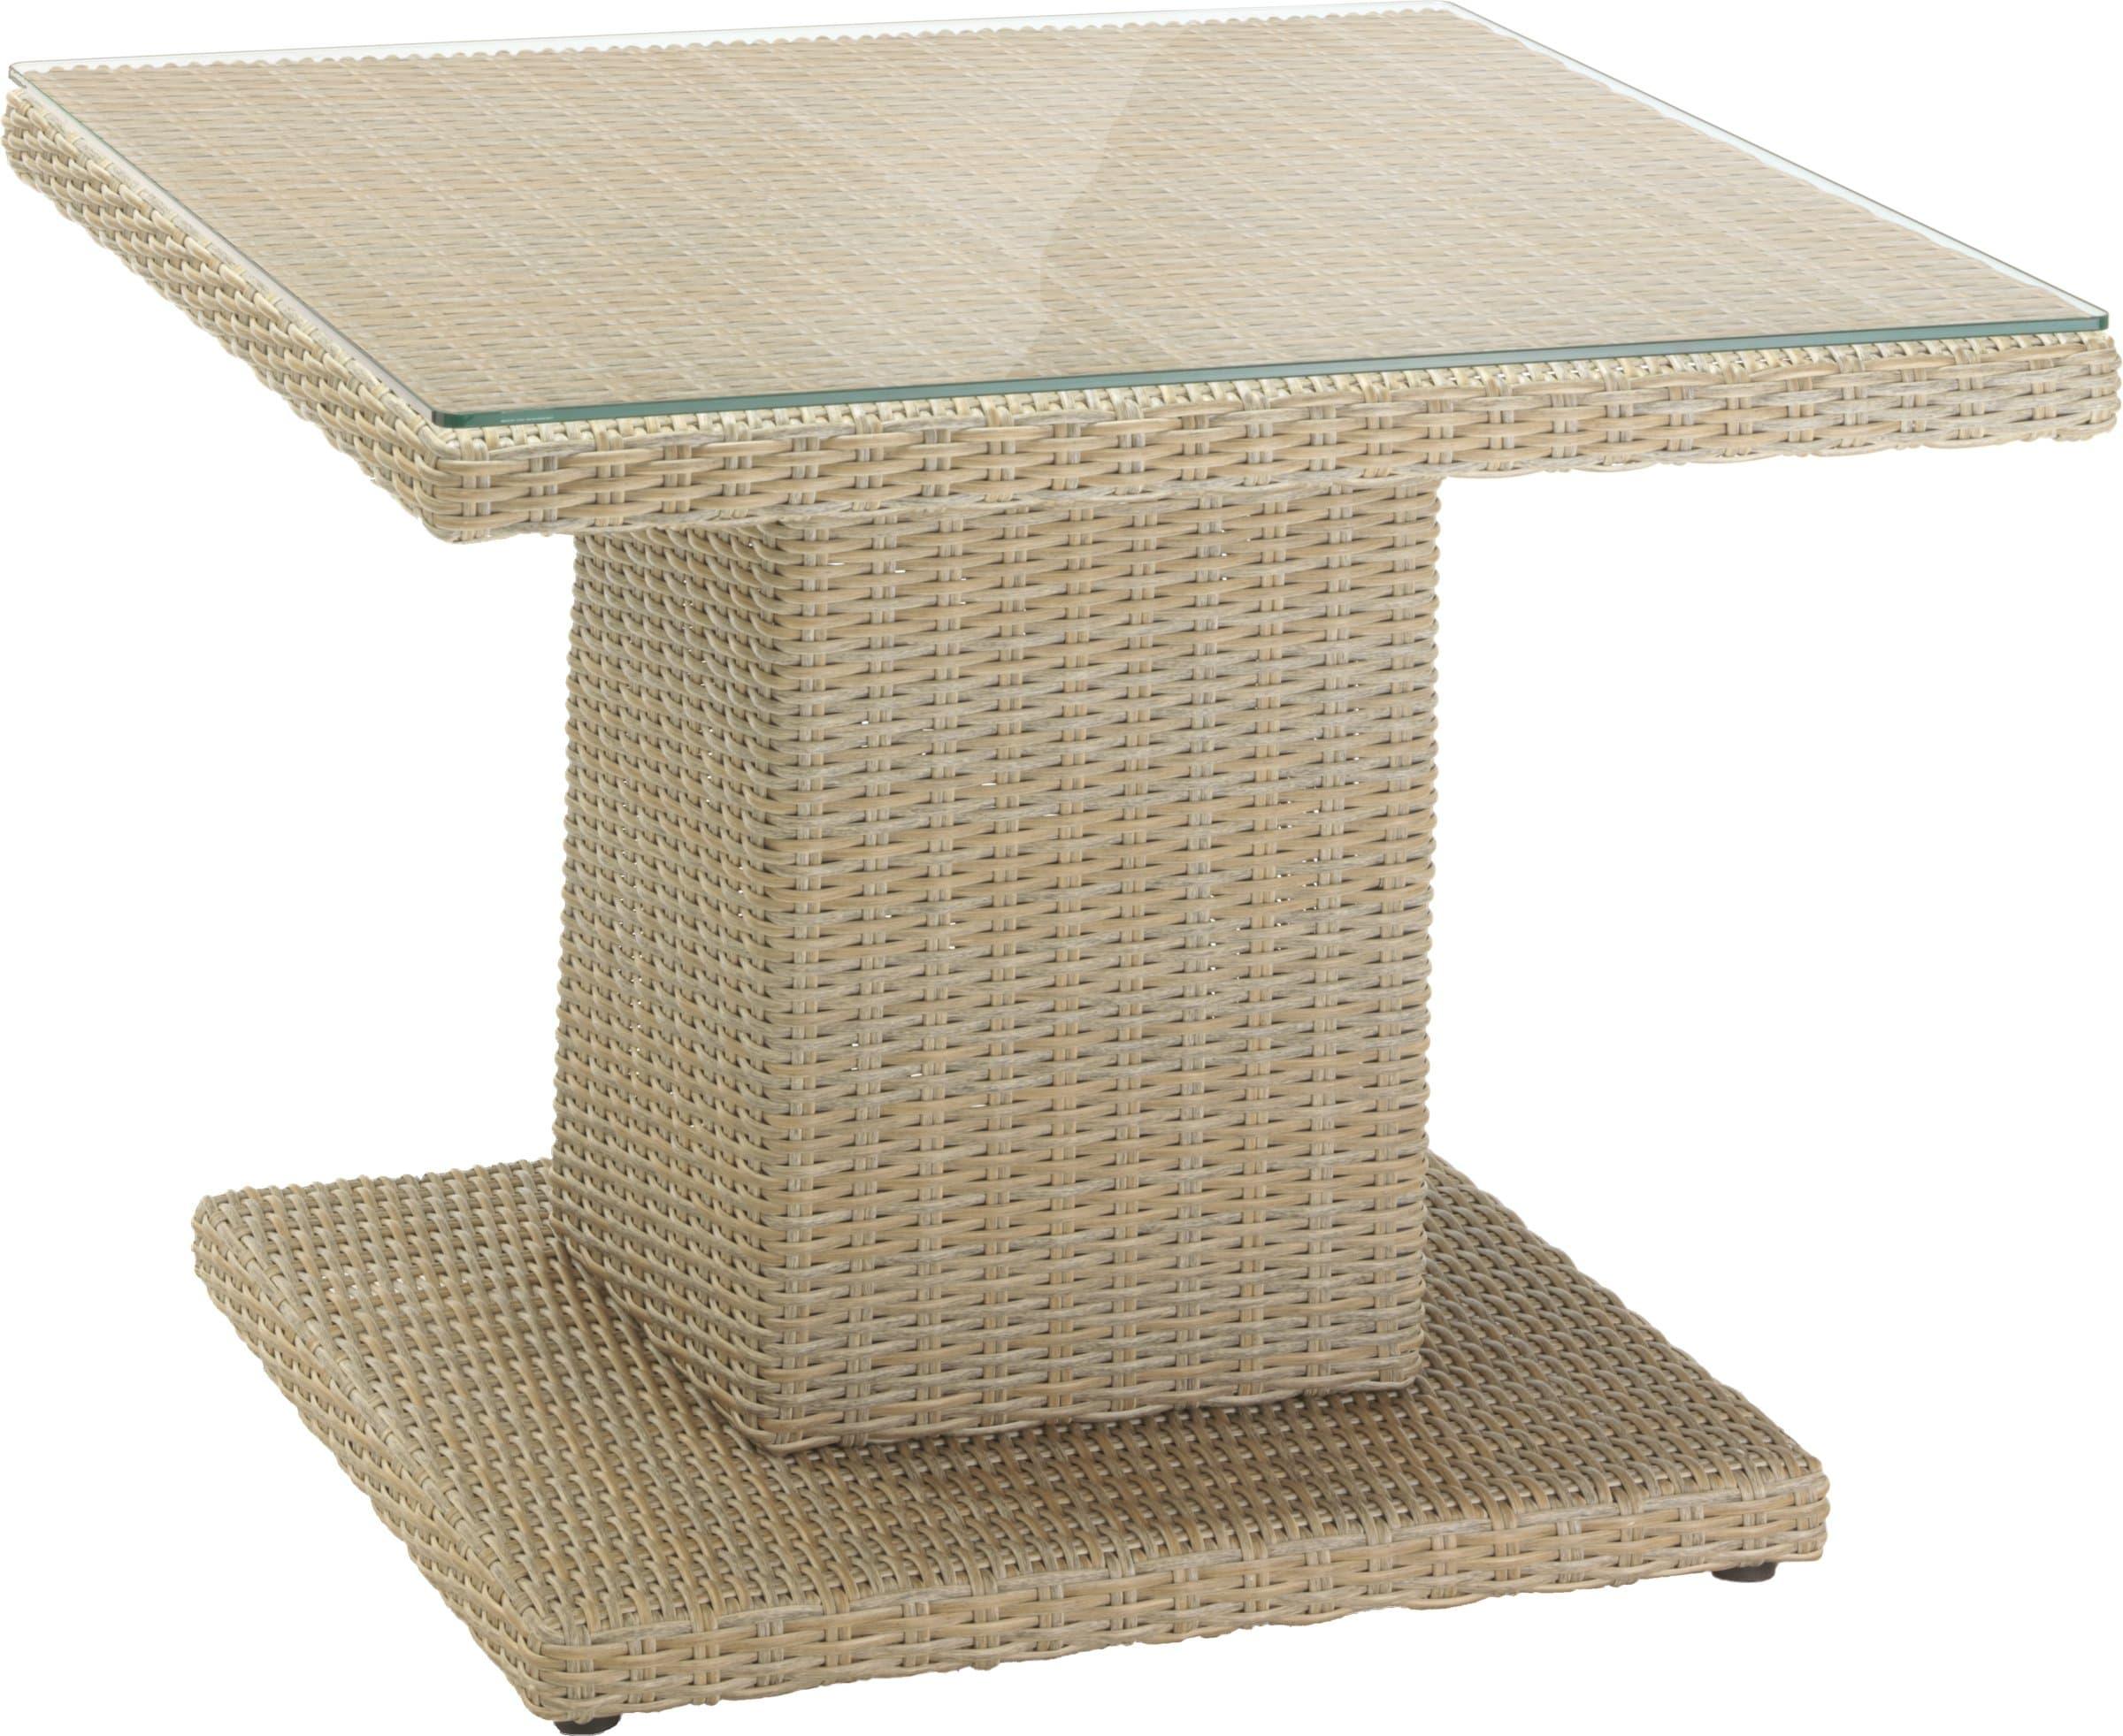 tisch trinidad 90 cm migros. Black Bedroom Furniture Sets. Home Design Ideas